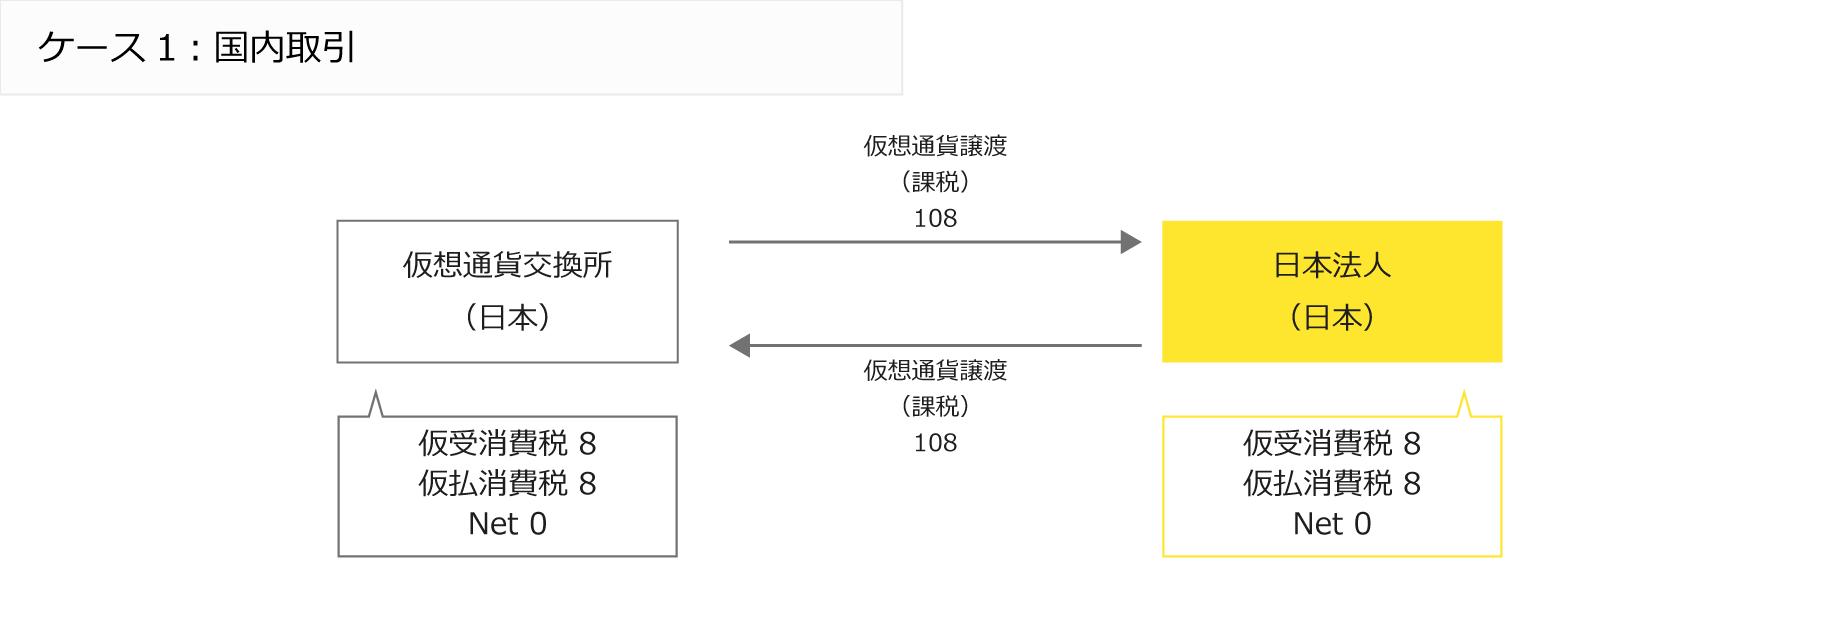 ケース1:国内取引/国内仮想通貨交換所と日本法人の間の仮想通過譲渡